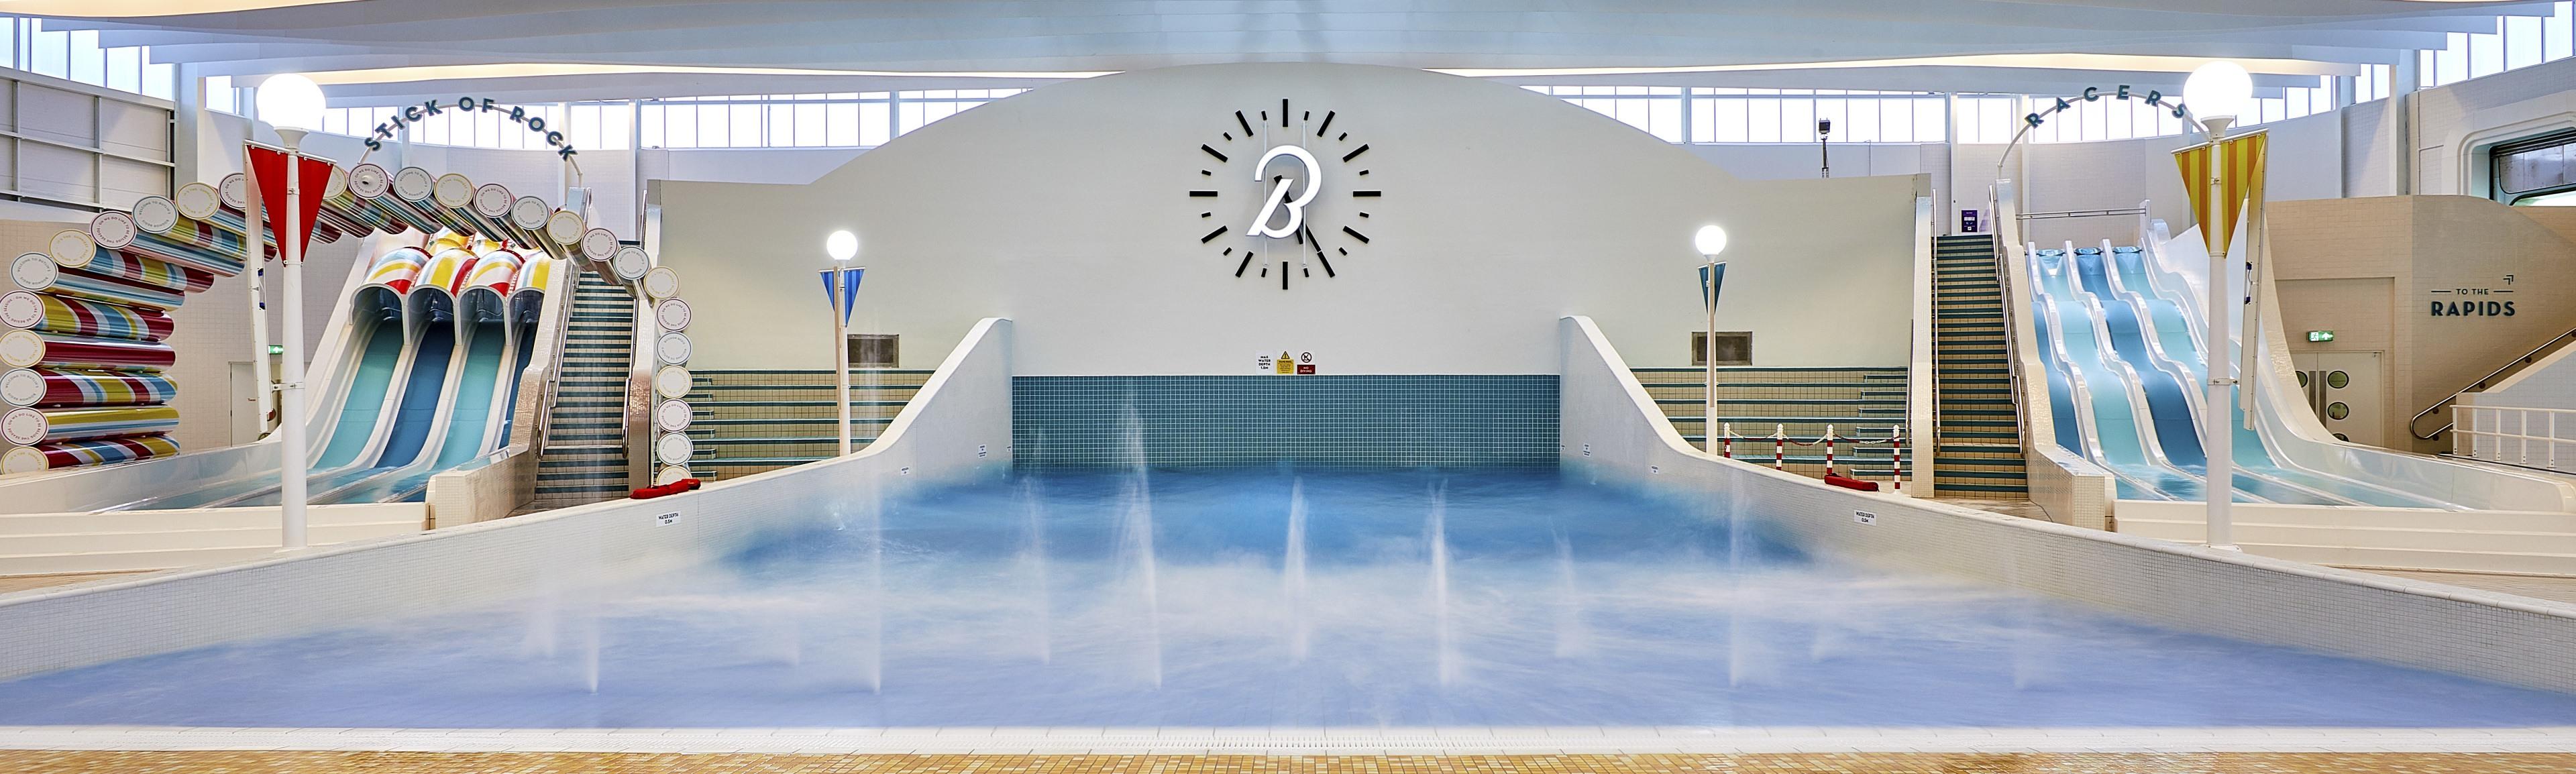 Splash Waterpark image